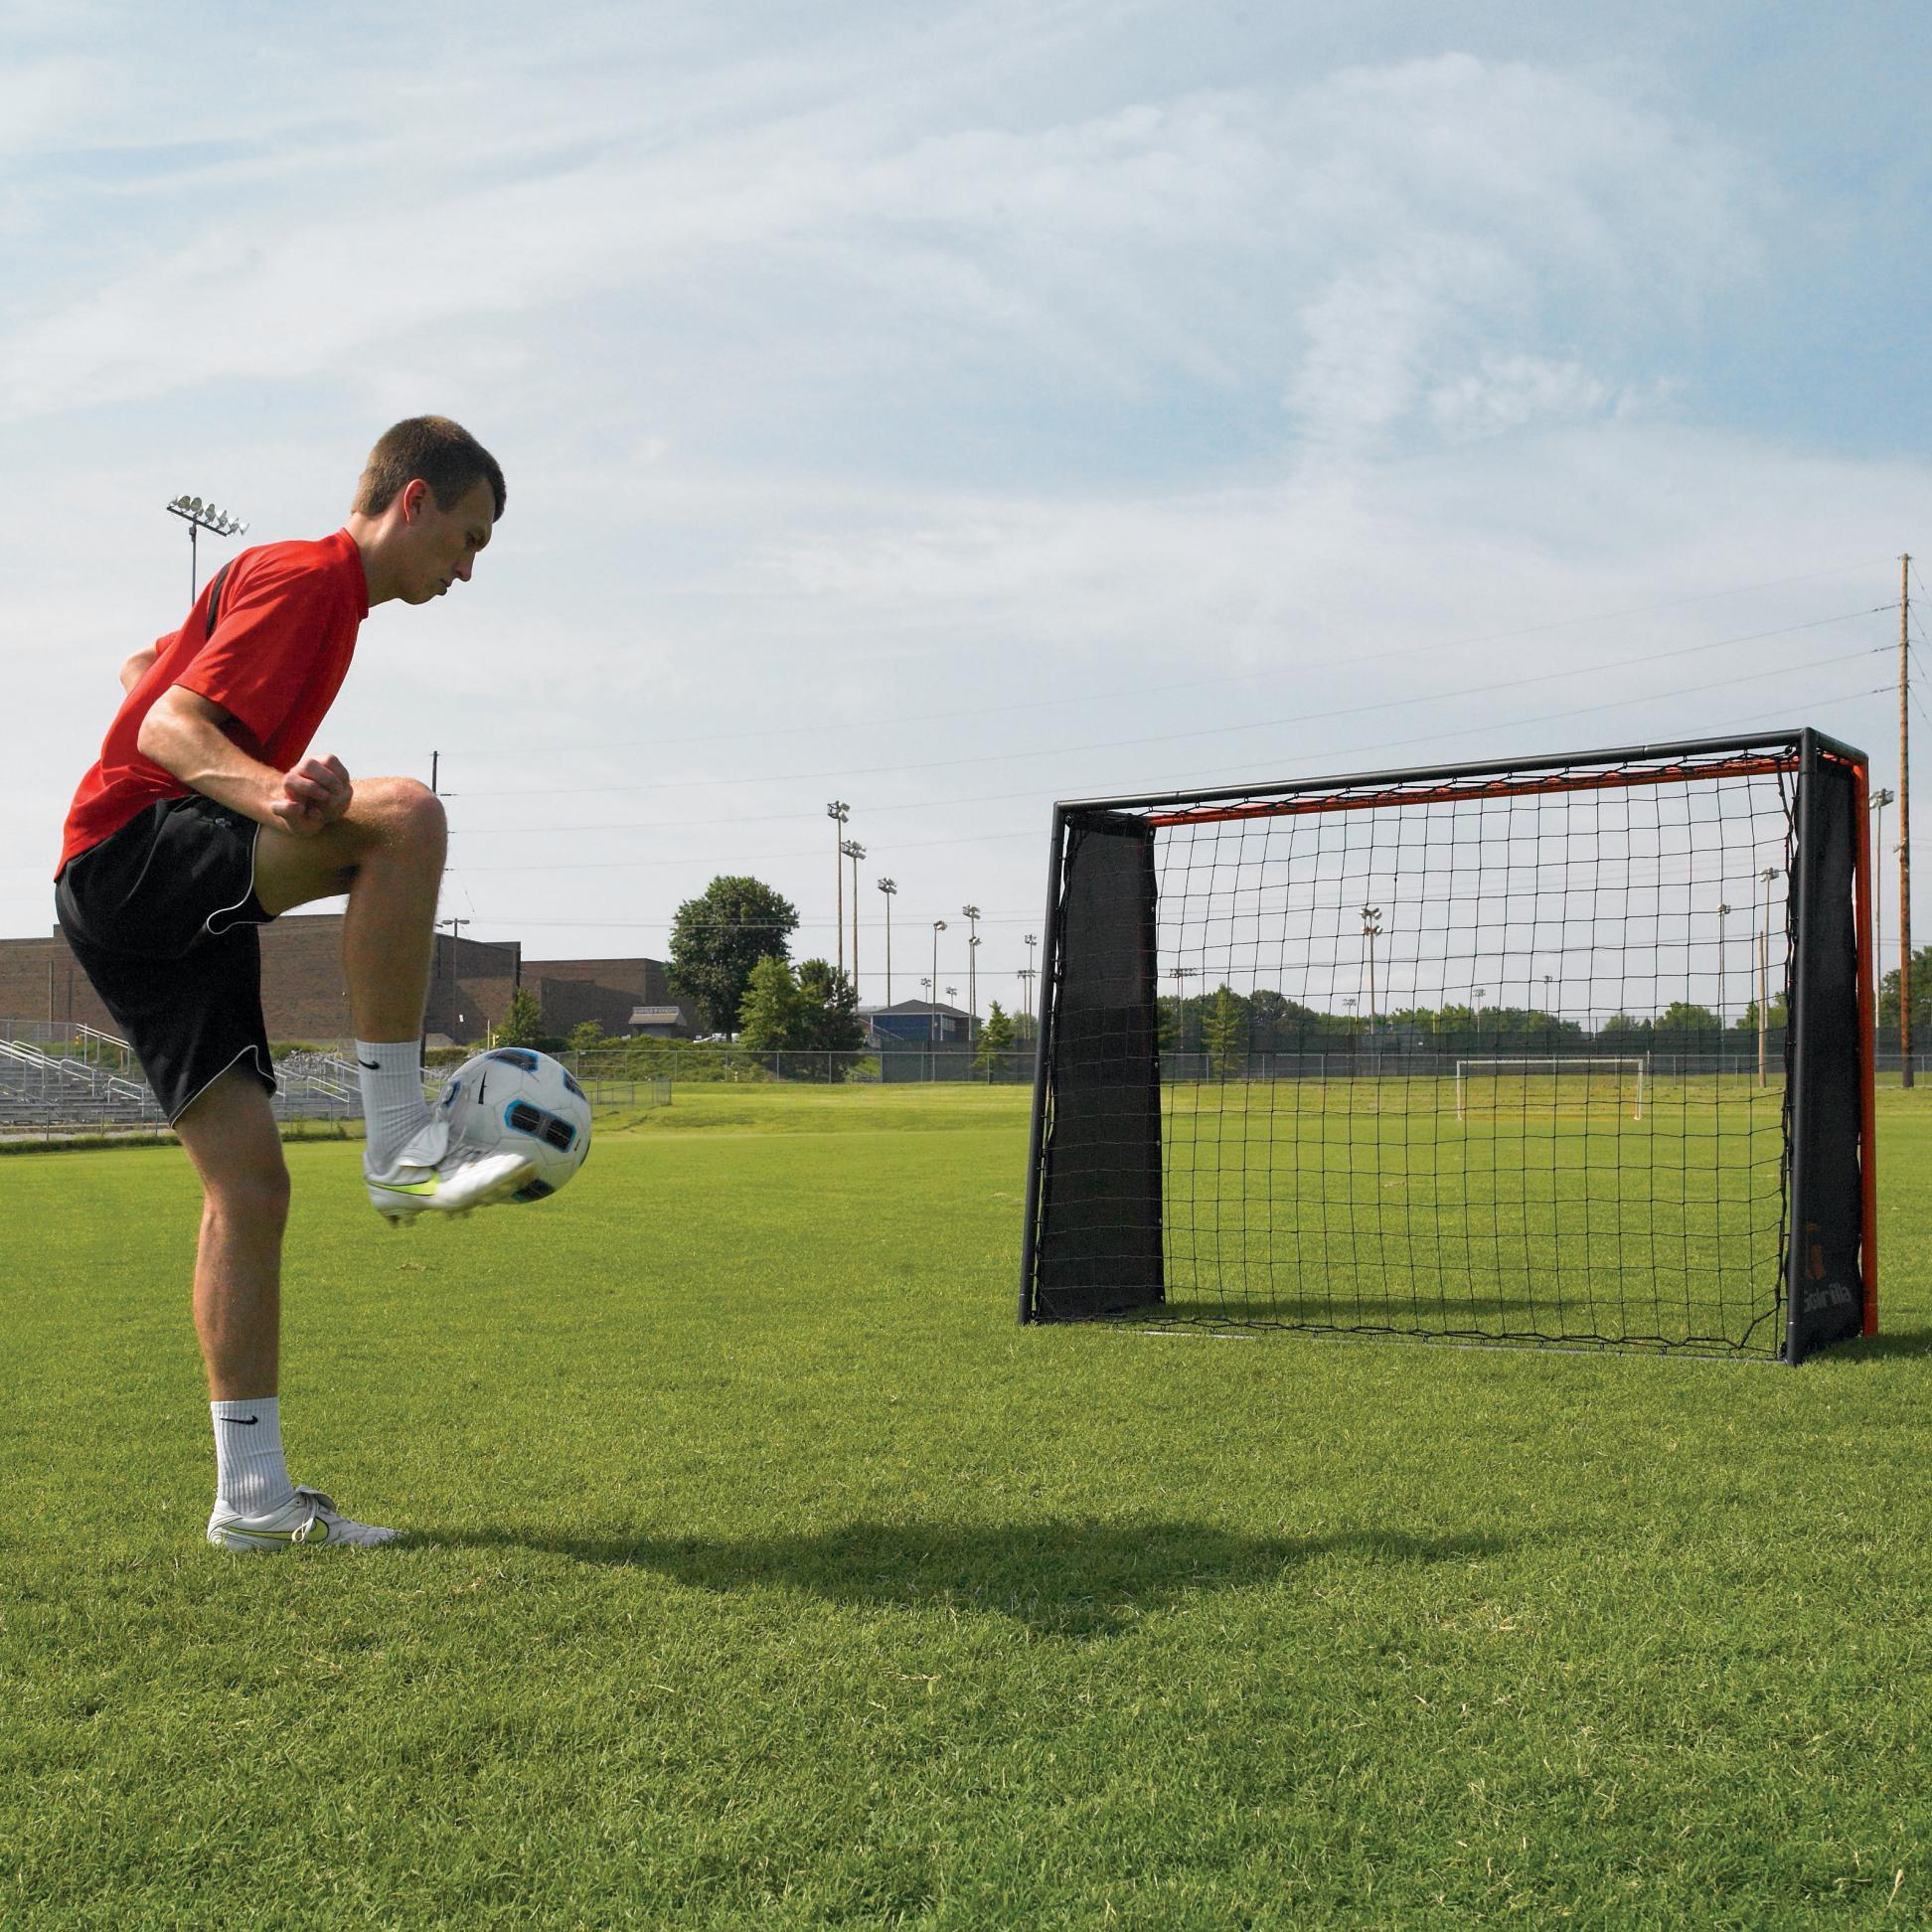 Amazon.com : Goalrilla Striker- Soccer Rebound Trainer : Soccer Rebounders : Sports & Outdoors